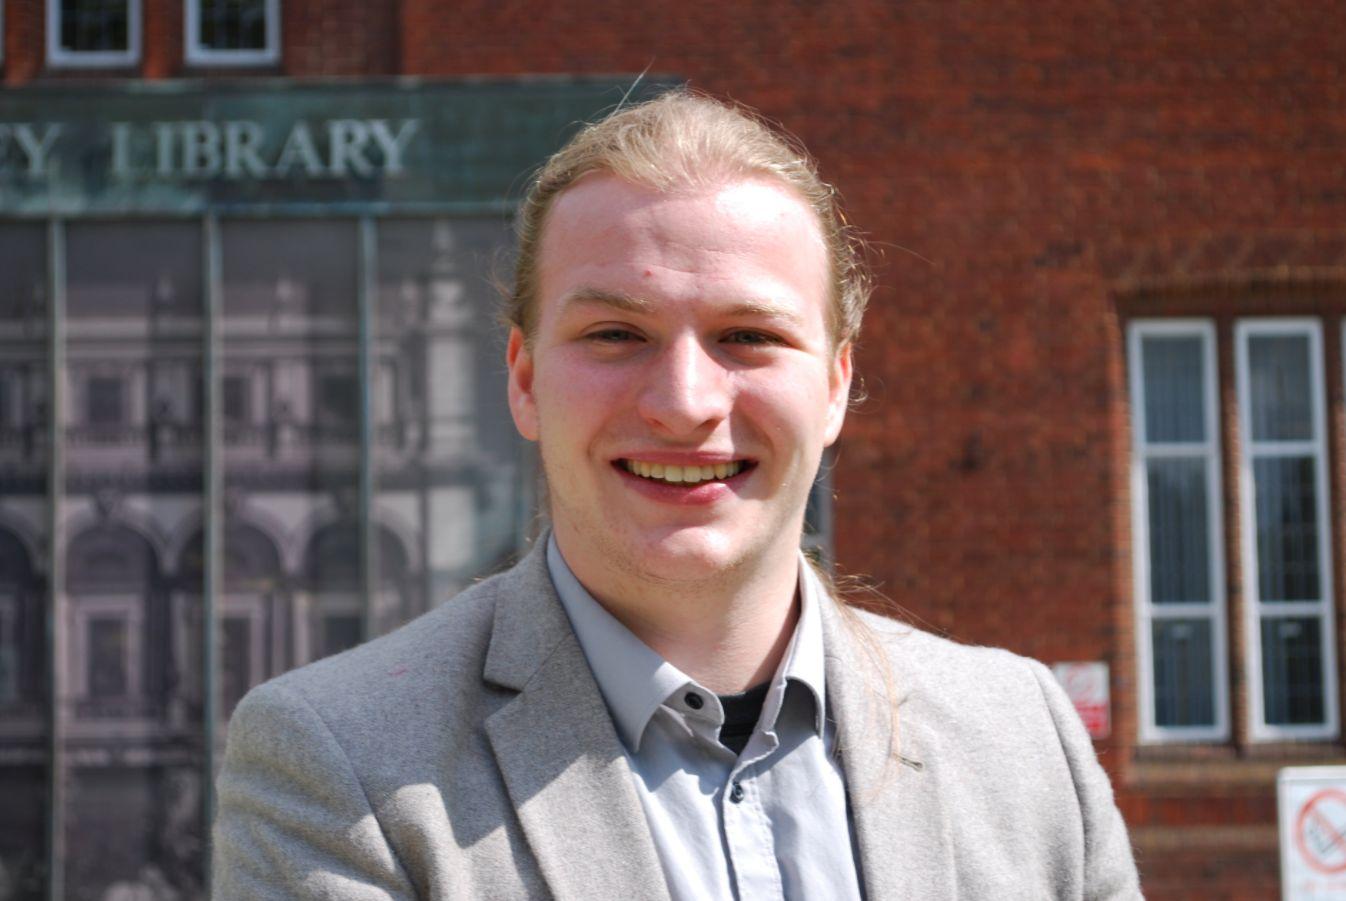 Thomas Gravatt, a Southampton University student, has delayed his final exams for the